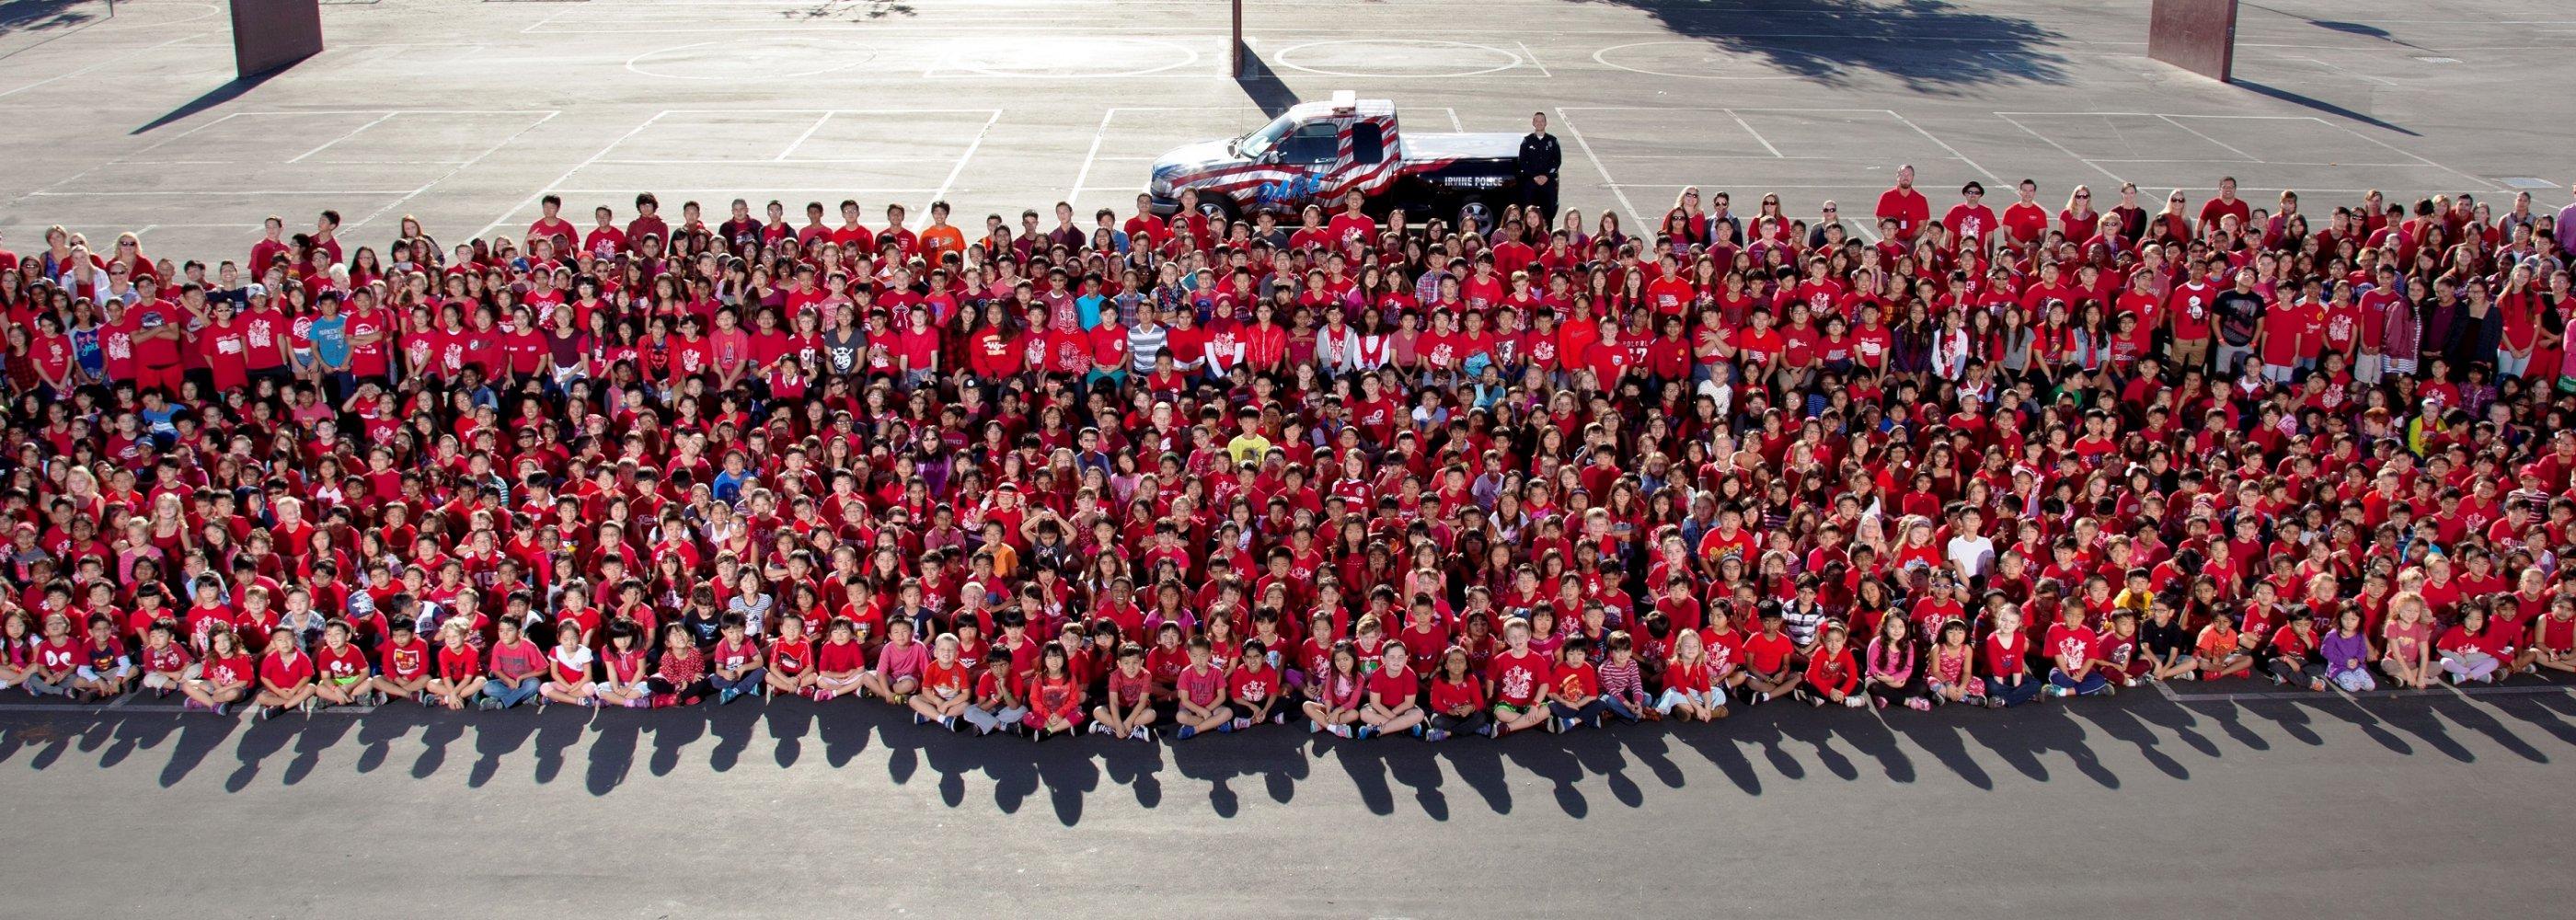 Red Ribbon 2015